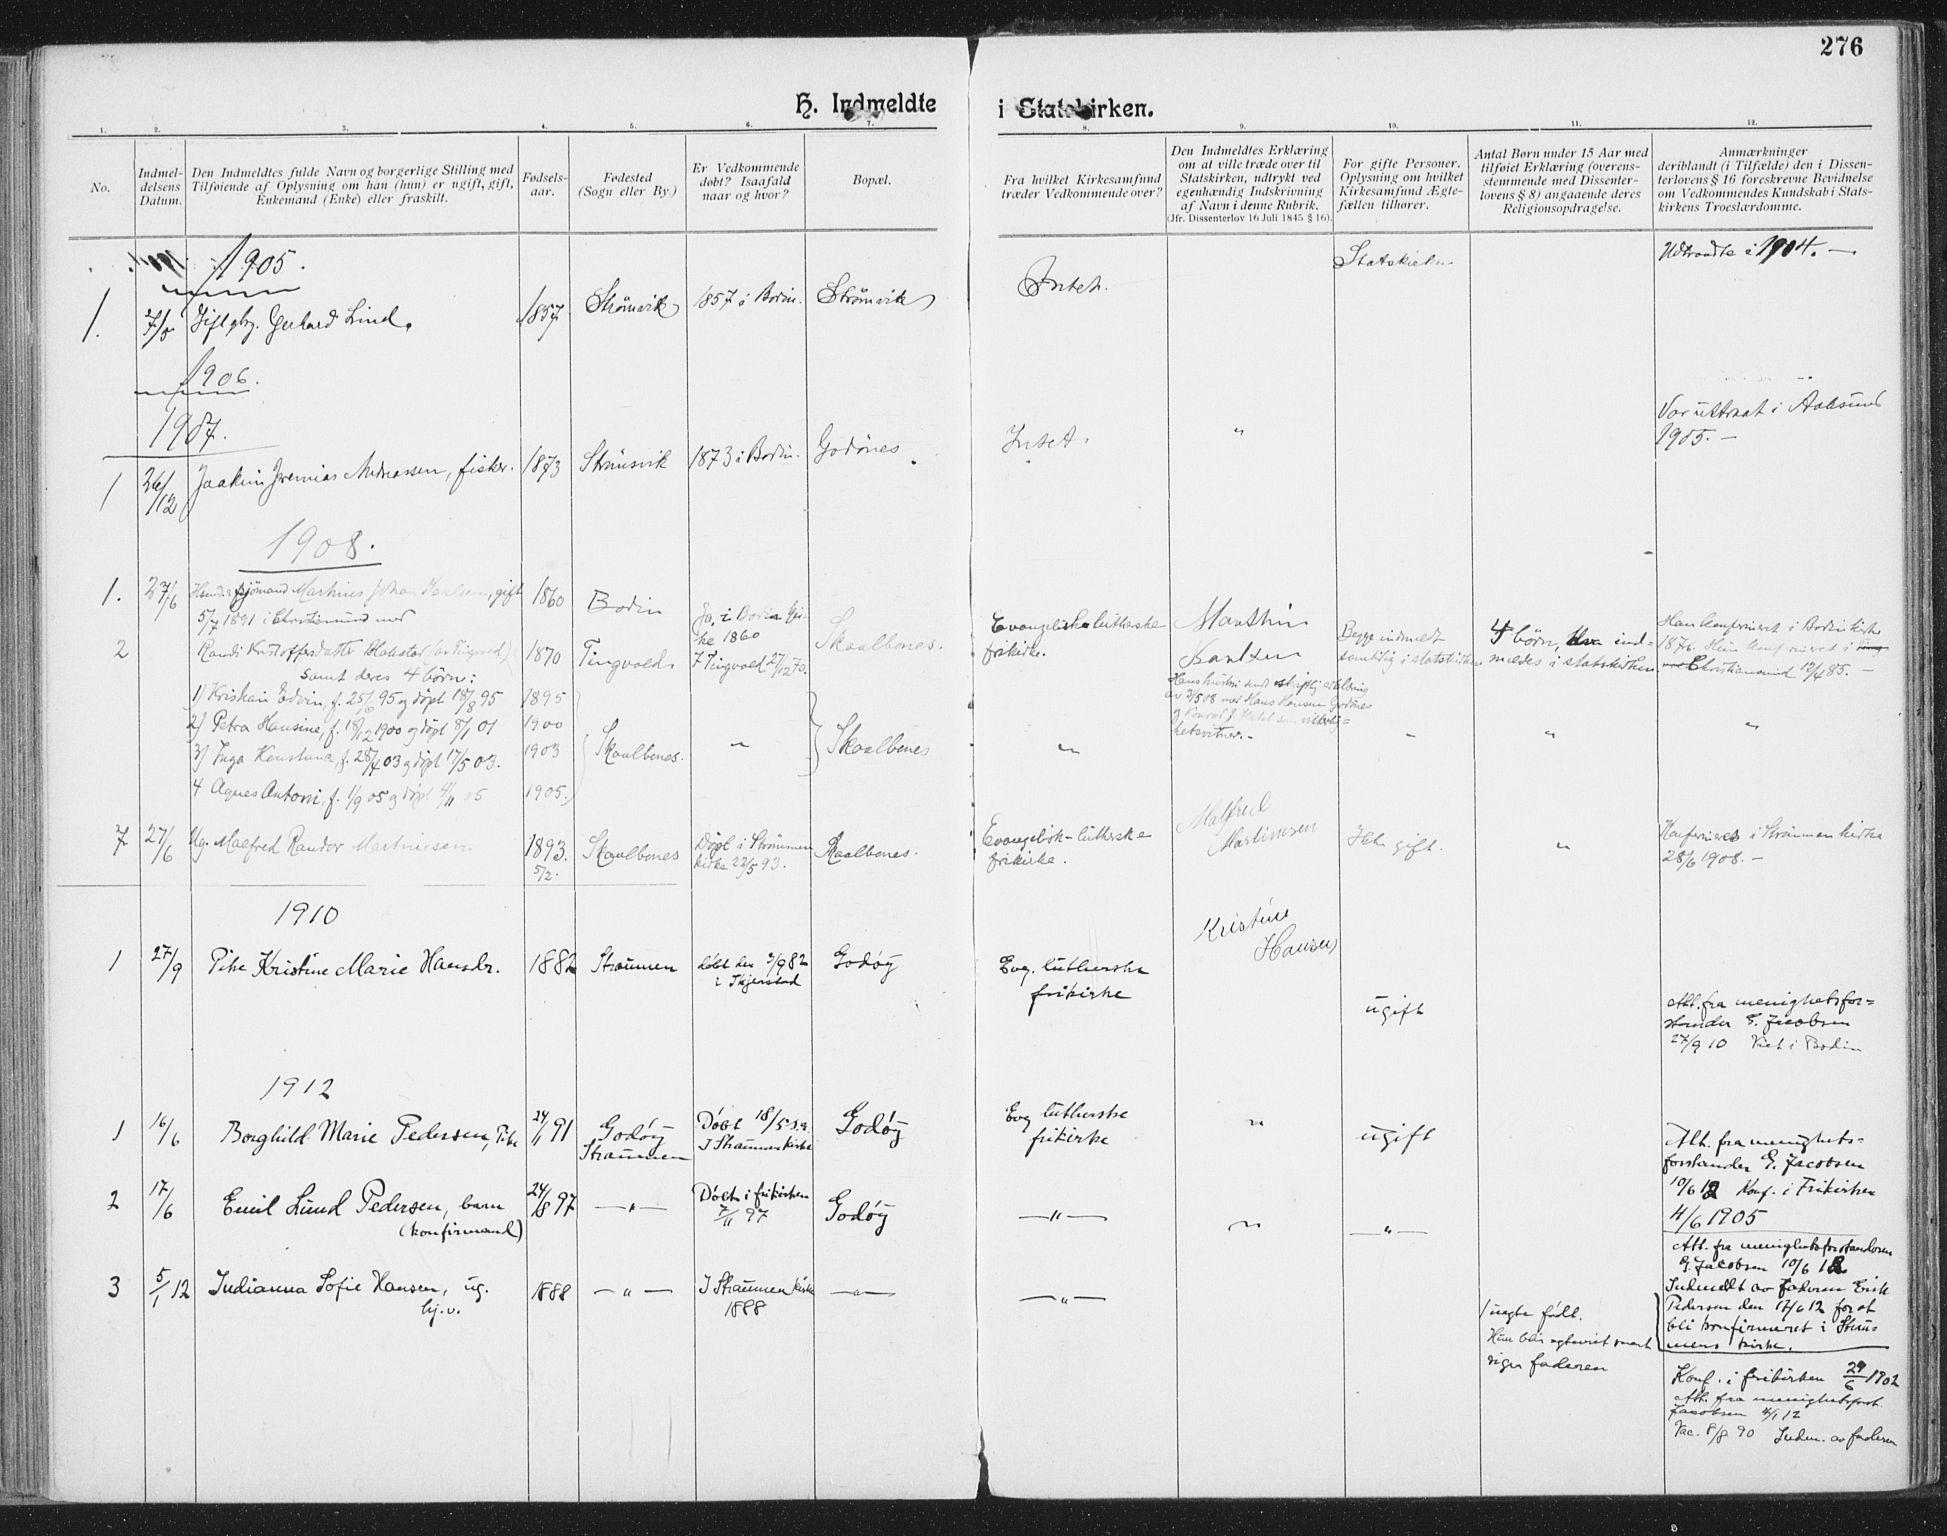 SAT, Ministerialprotokoller, klokkerbøker og fødselsregistre - Nordland, 804/L0081: Ministerialbok nr. 804A02, 1901-1915, s. 276